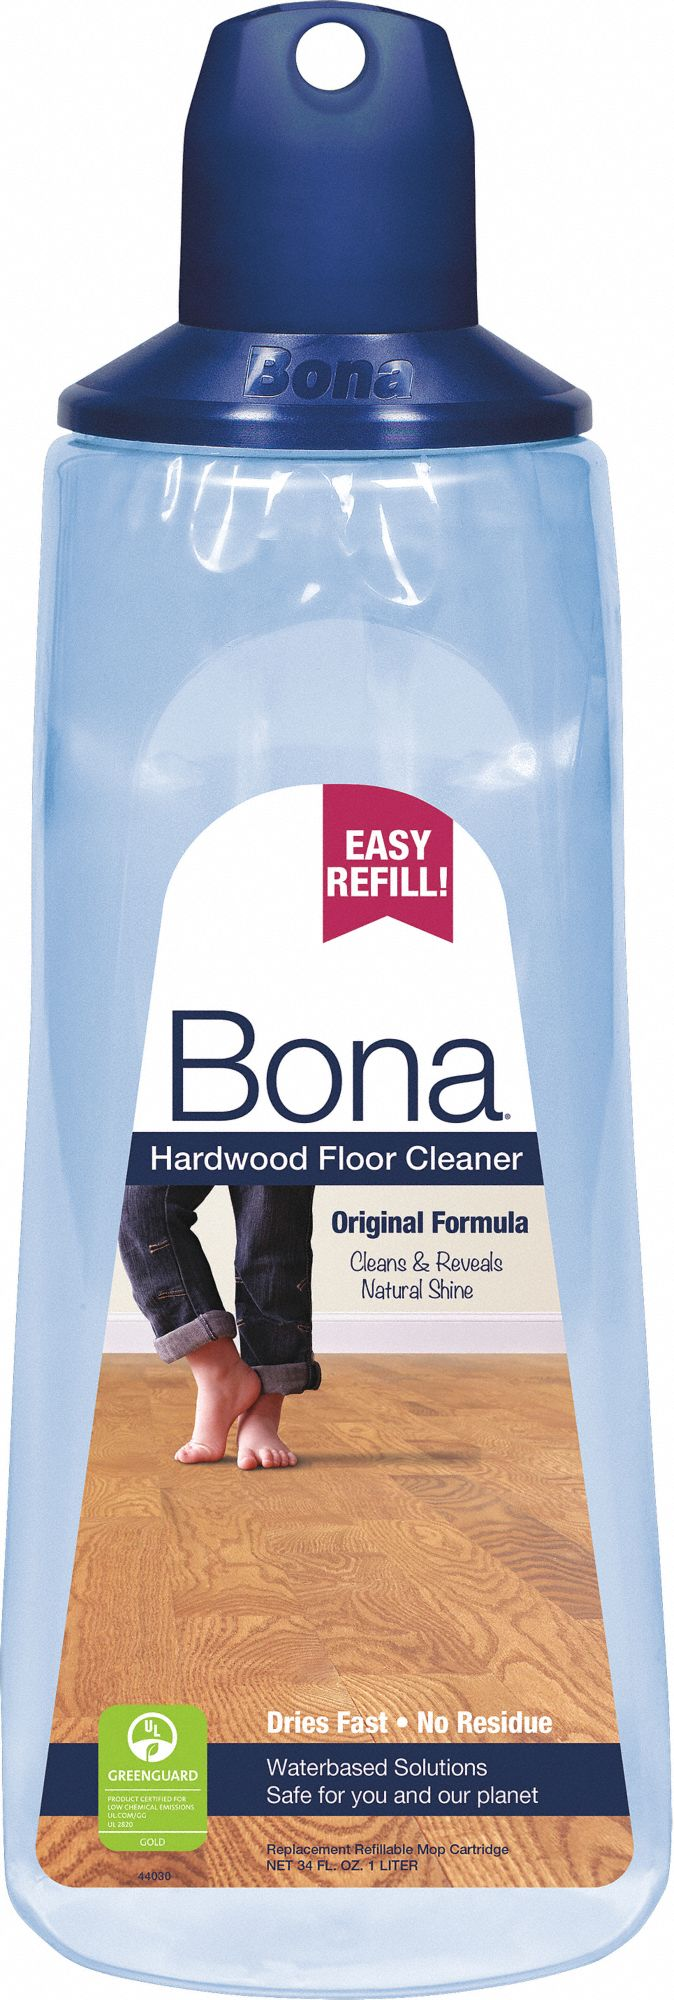 Bona 34 Oz Hardwood Floor Cleaner 1 Ea 420d29